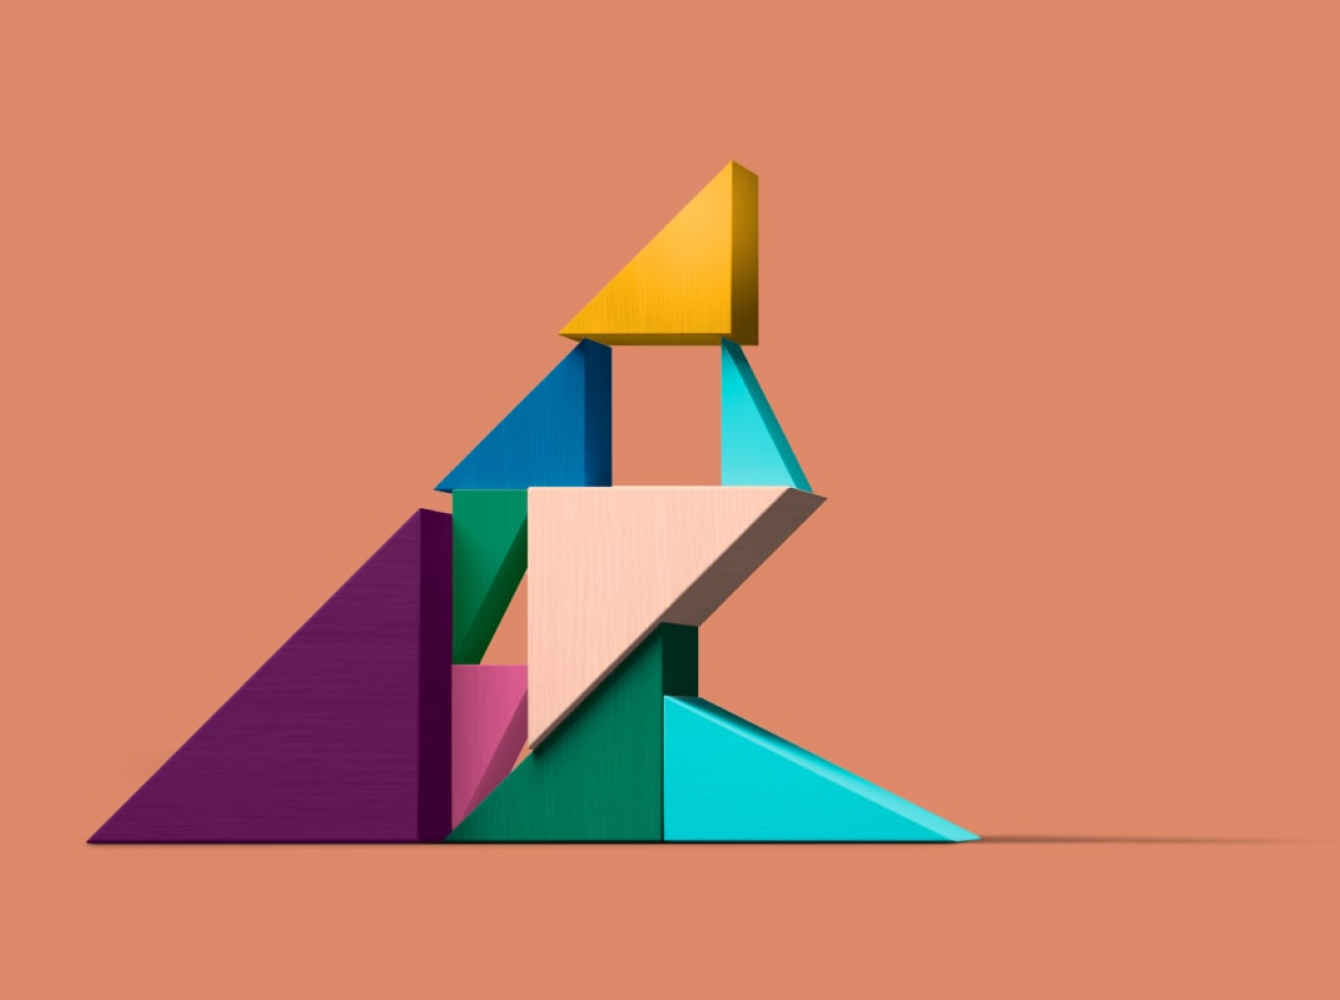 Shapes moving upwards representing change